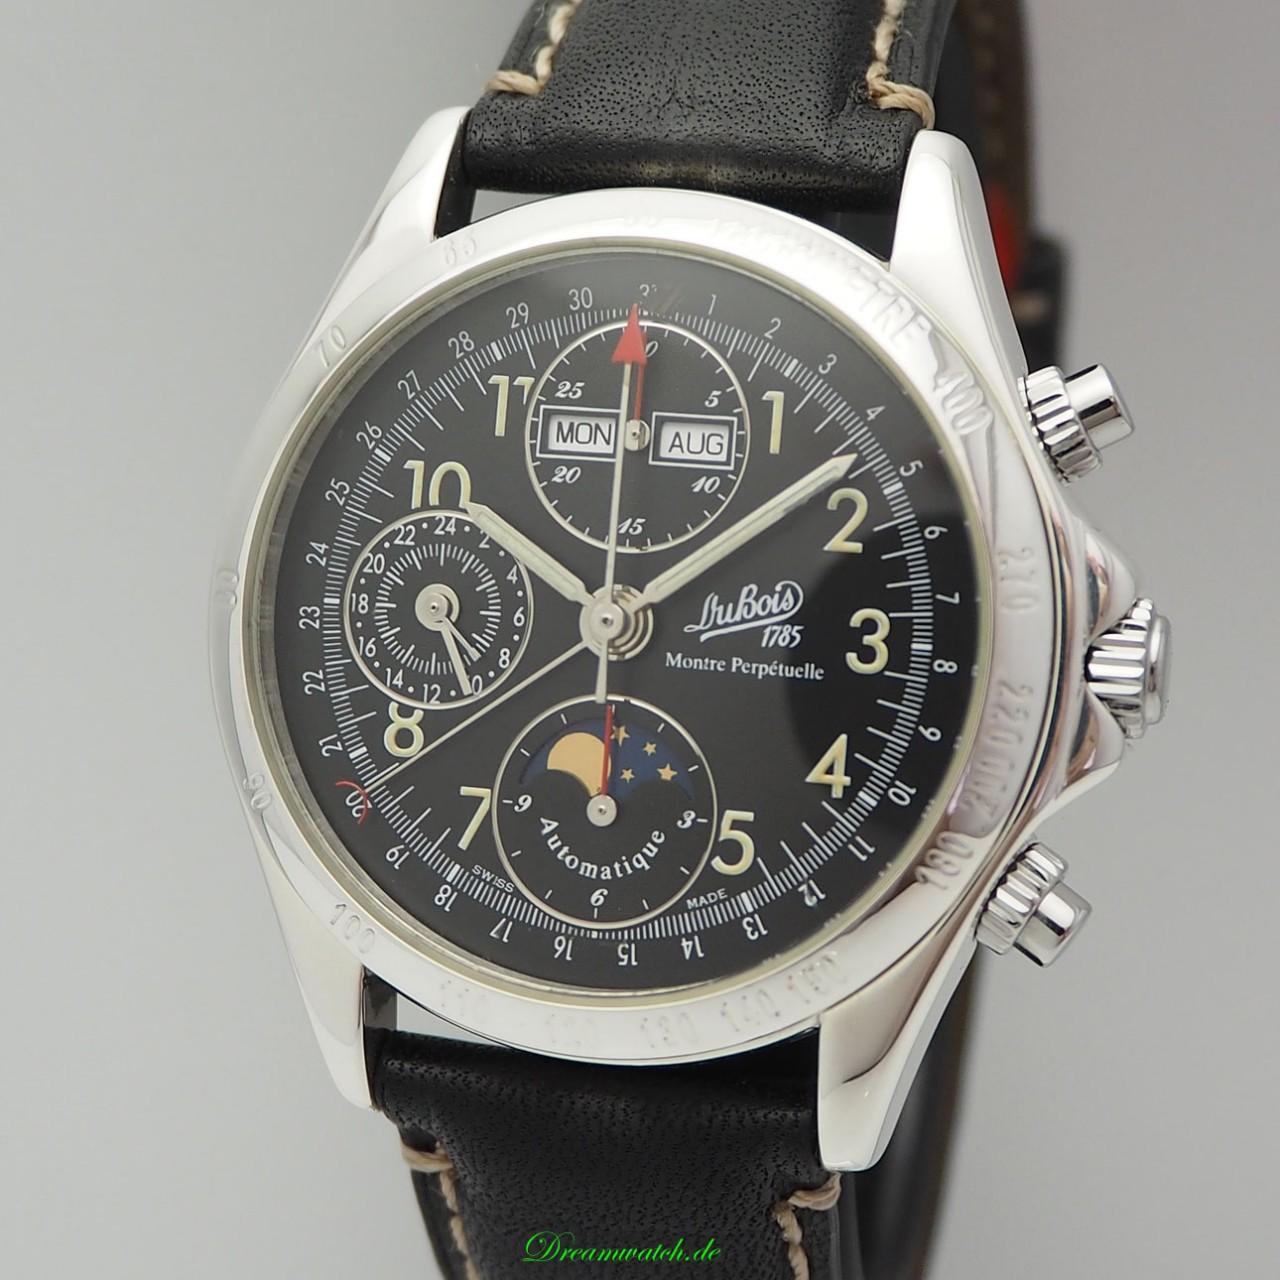 Dubois & Fils Montre Perpetuelle Vollkalender Mond Chronograph Limited 599 - Silber 925/ Box